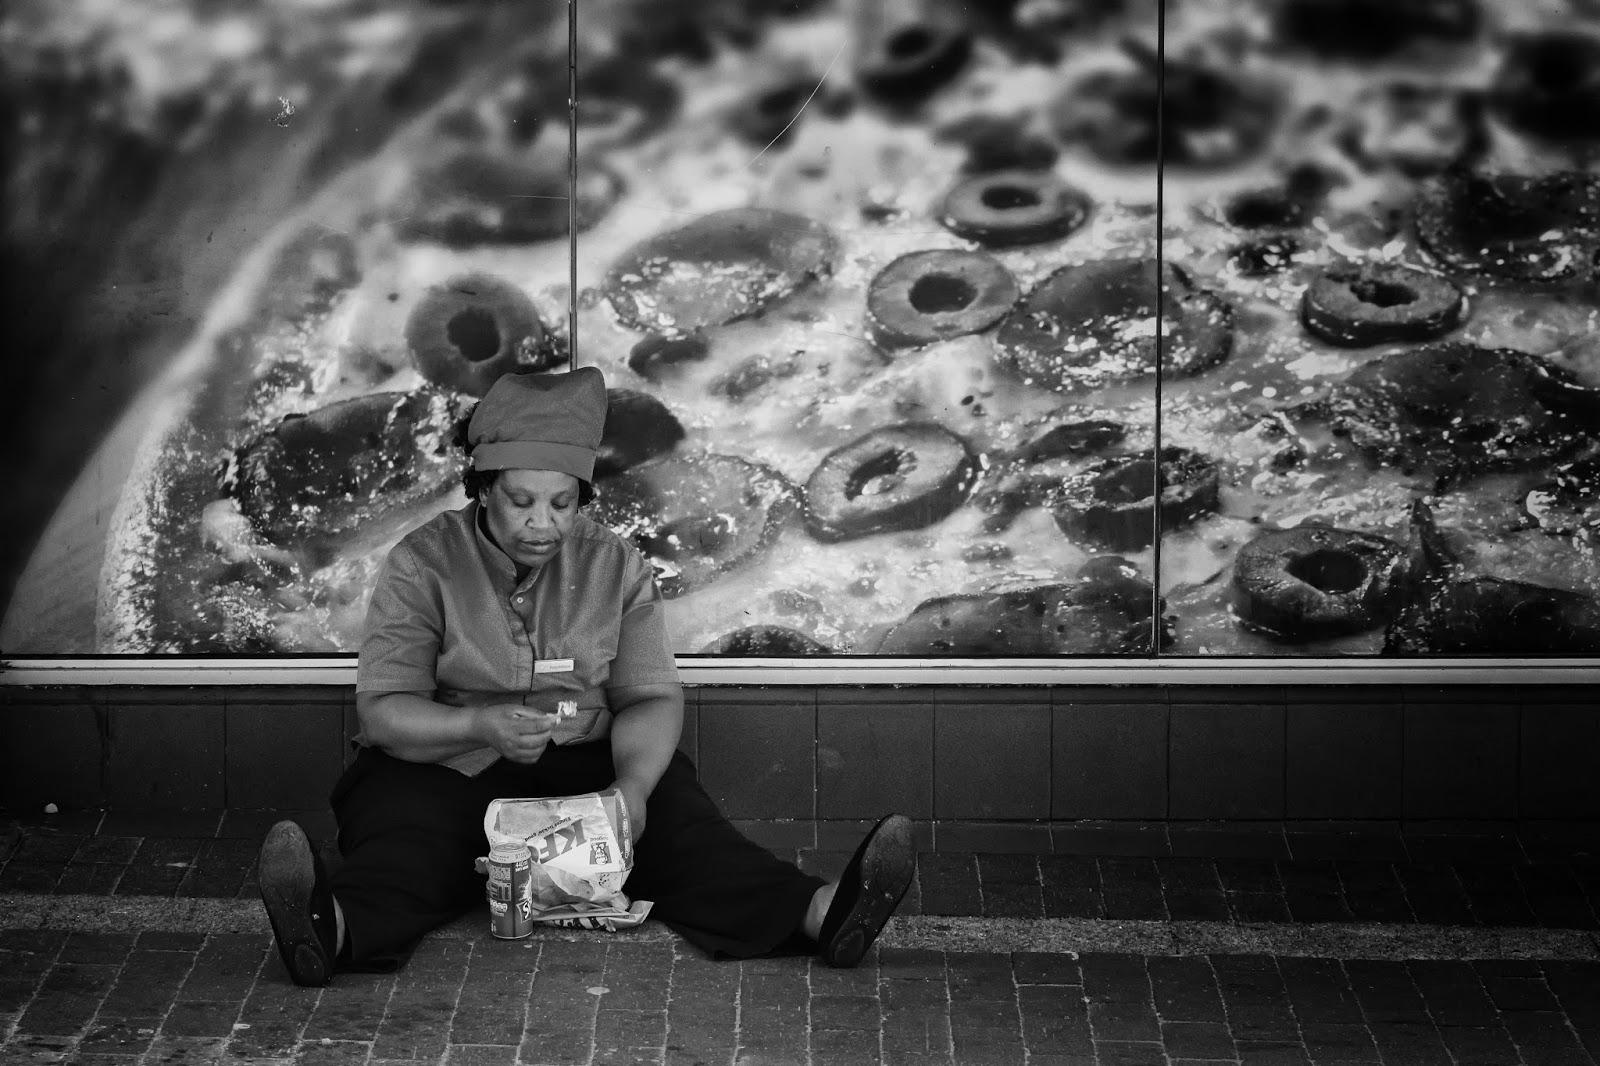 A woman eats junk food beneath a poster of junkfood.